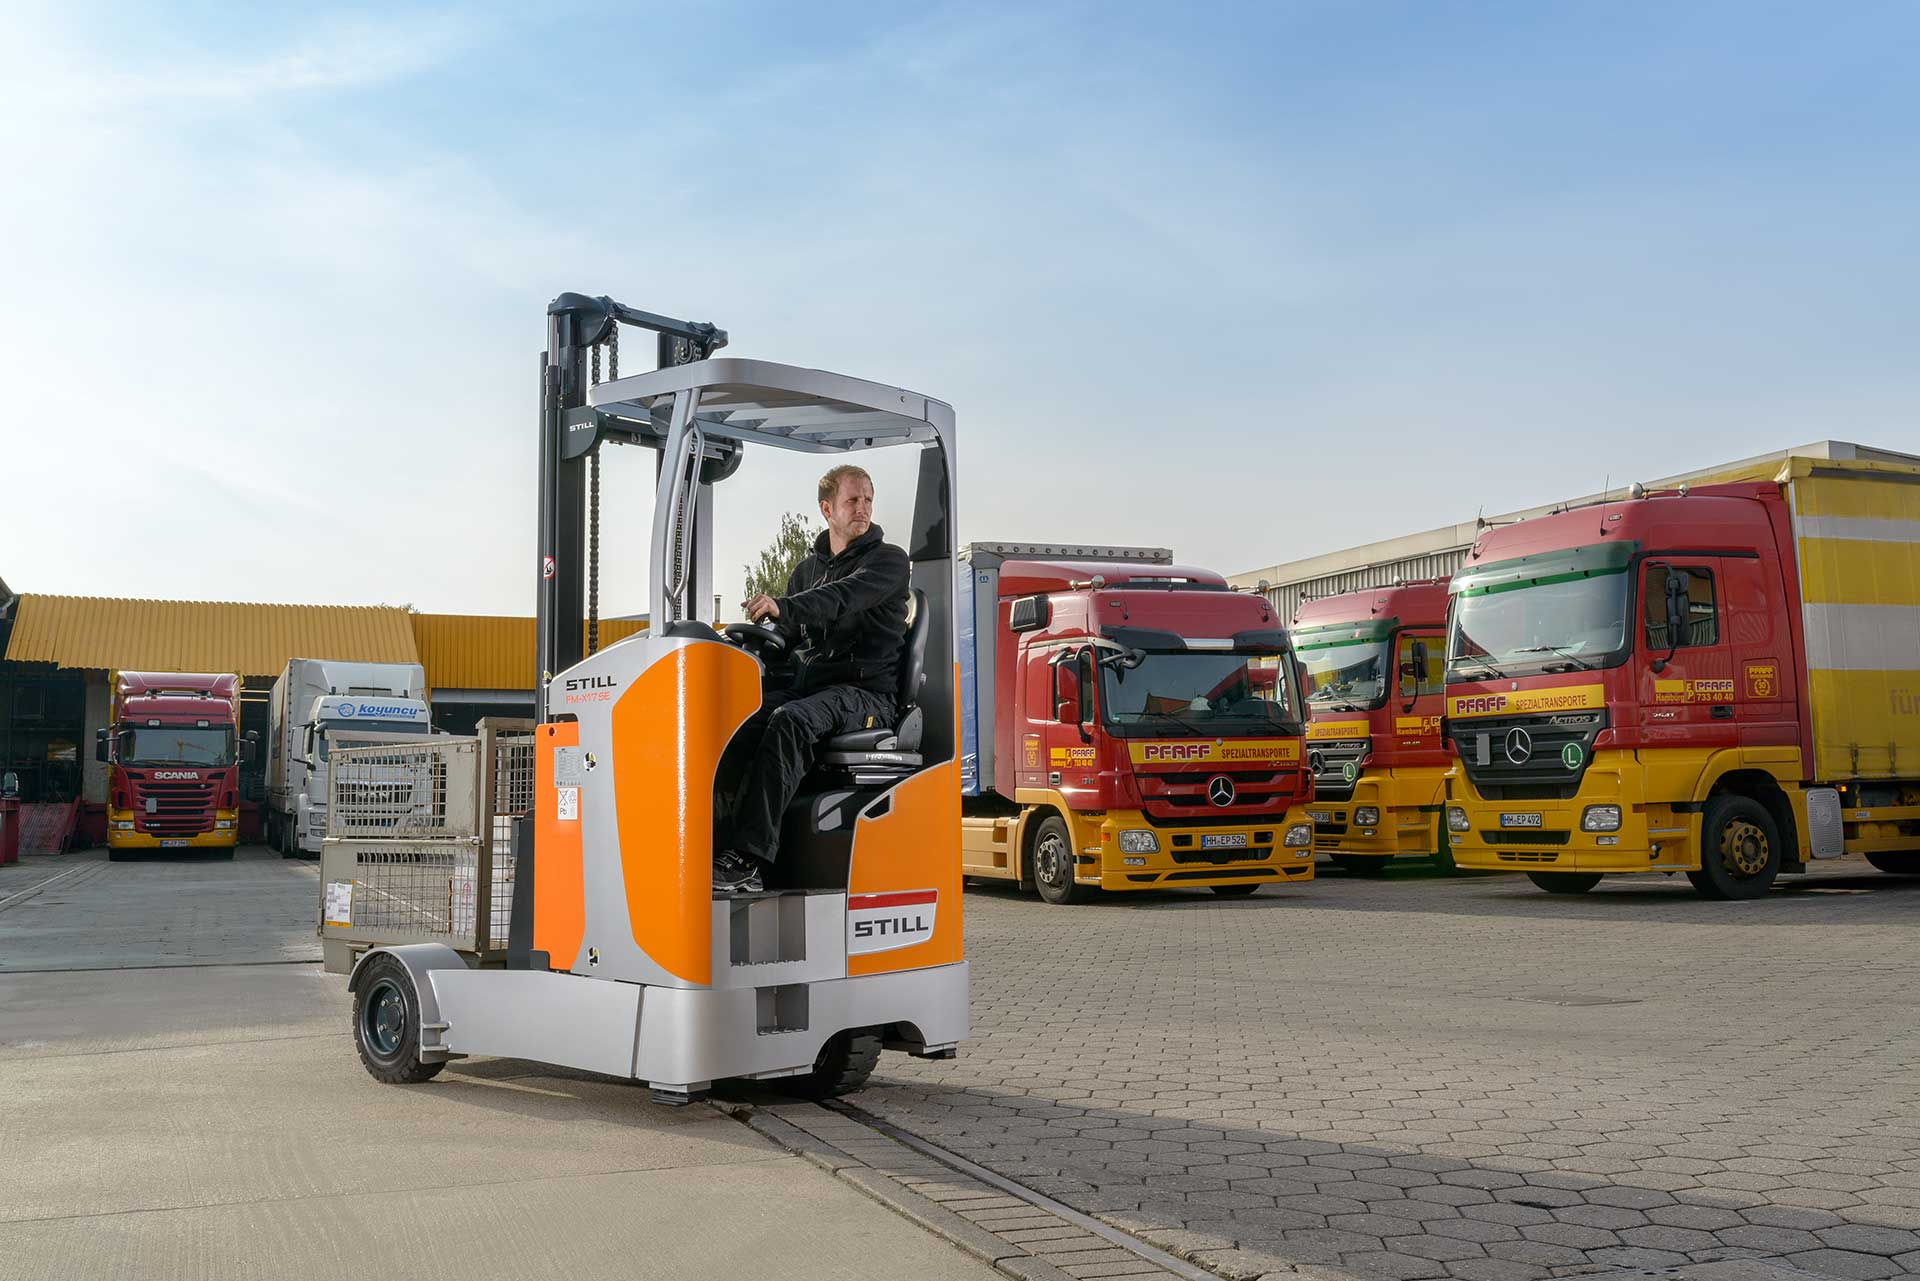 Still Fm X Reach Truck Range Gwent Mechanical Handling